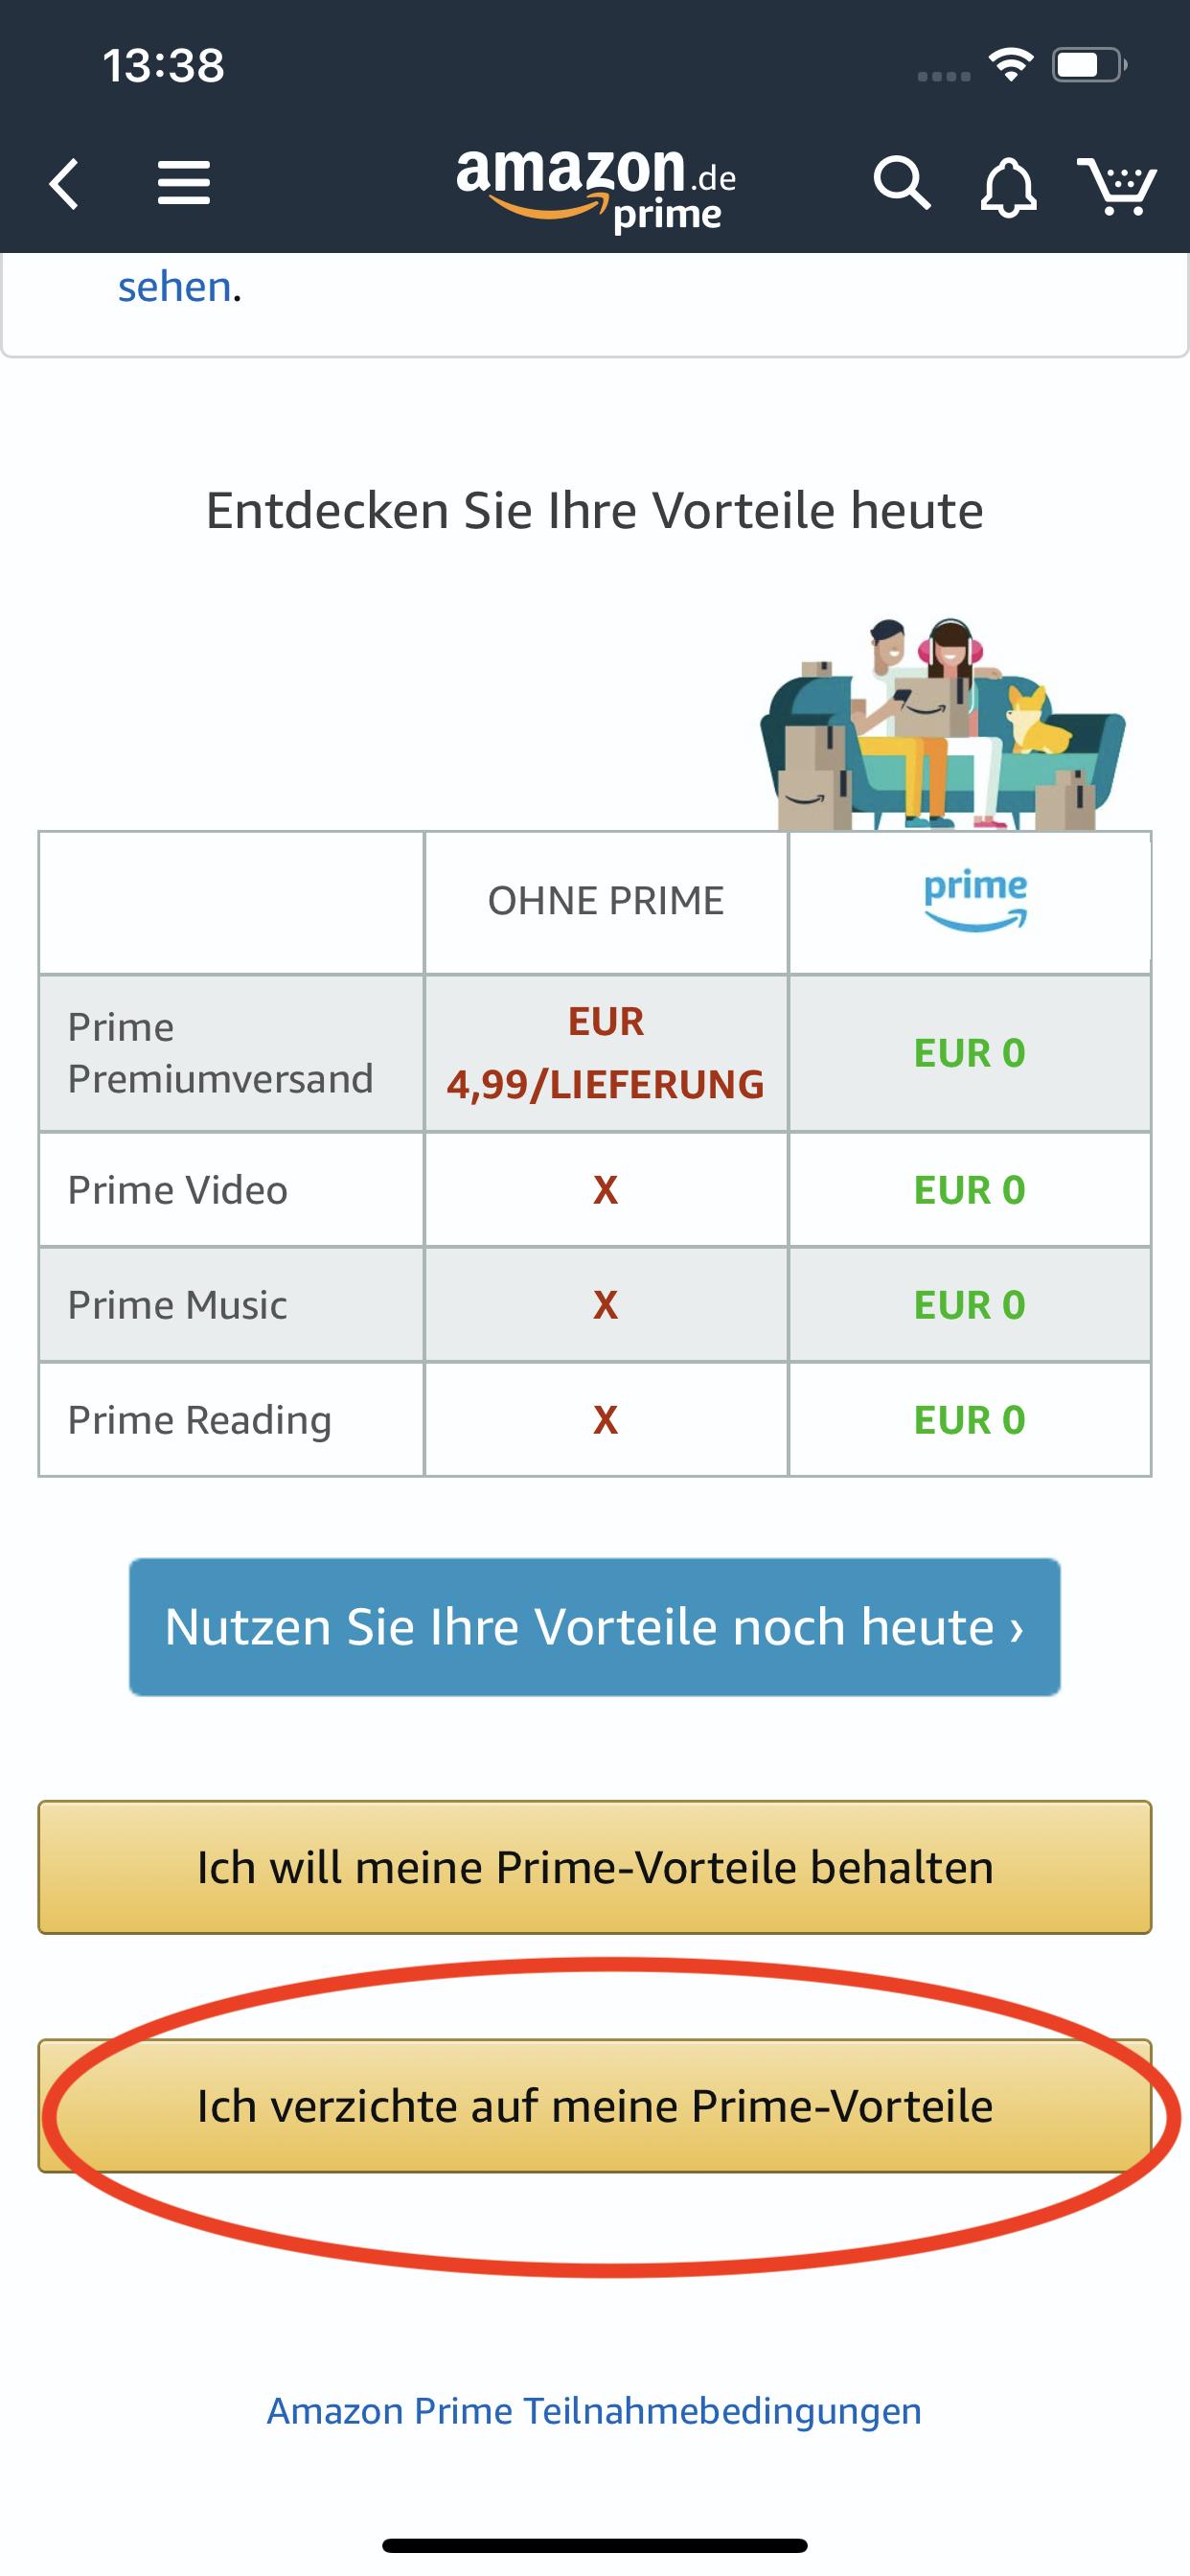 Amazon Prime Video: Abo kündigen in wenigen Schritten